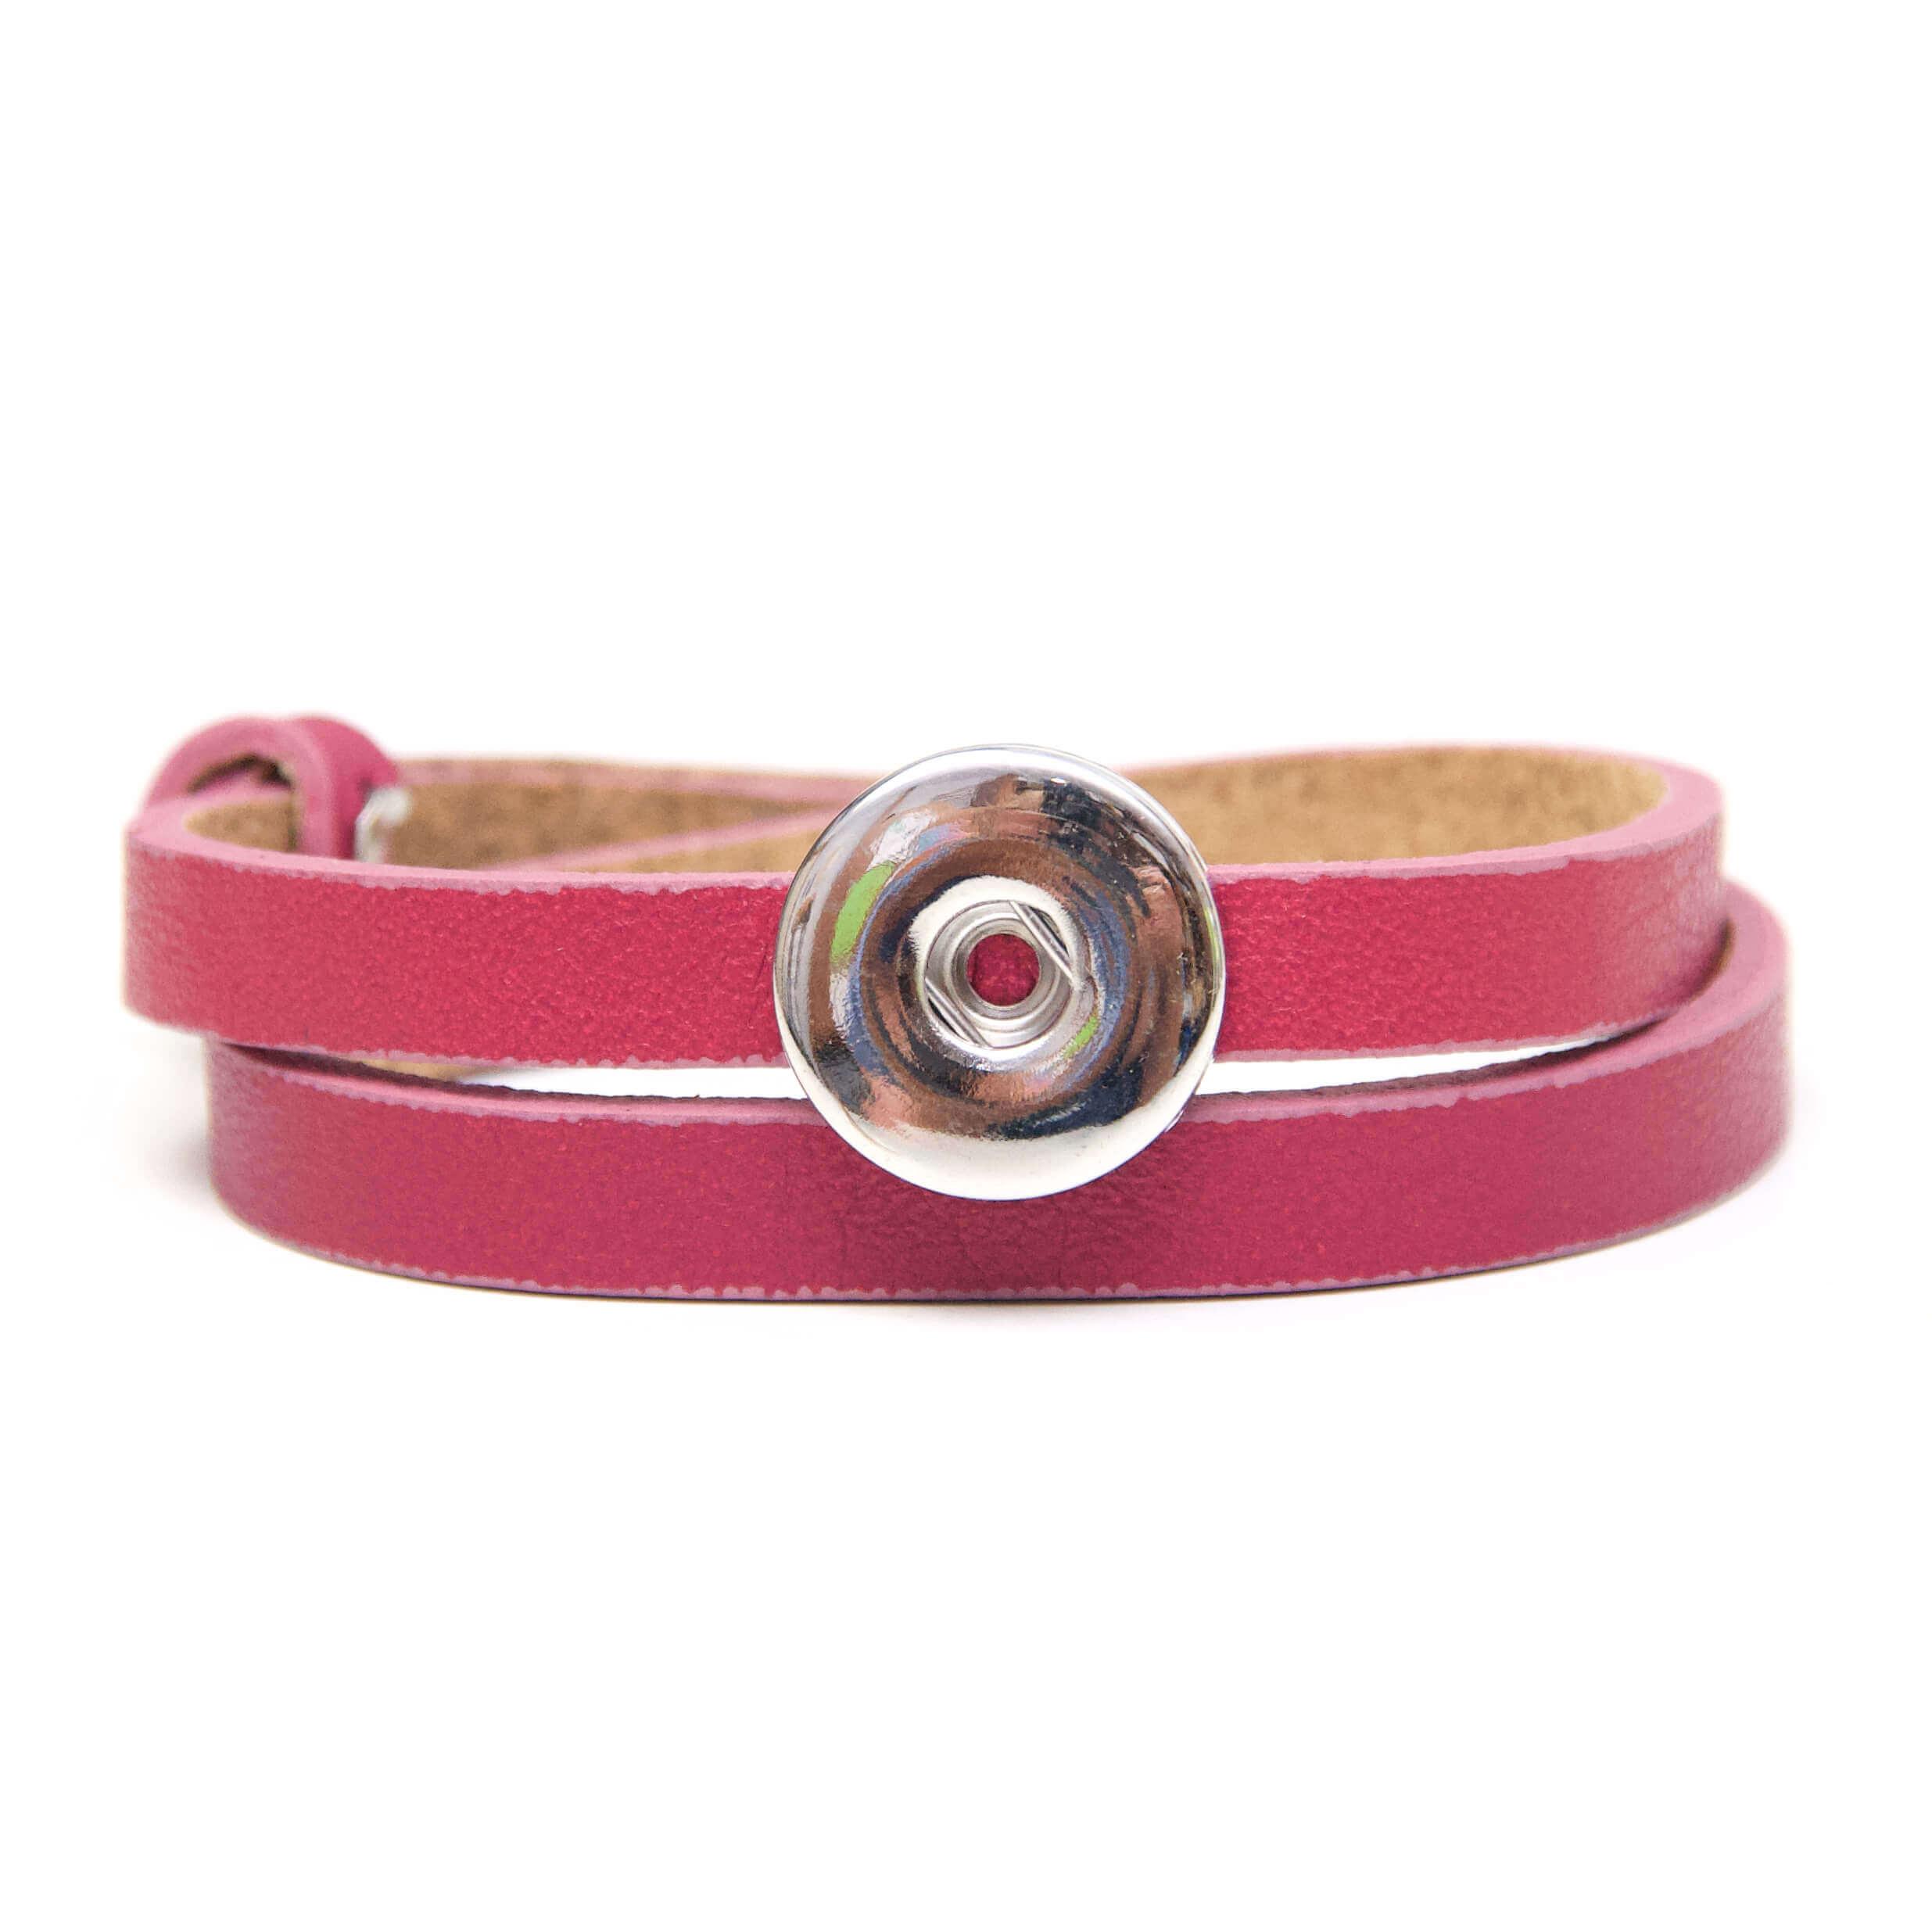 Druckknopf Lederarmband in rosarot für 16mm Druckknöpfe